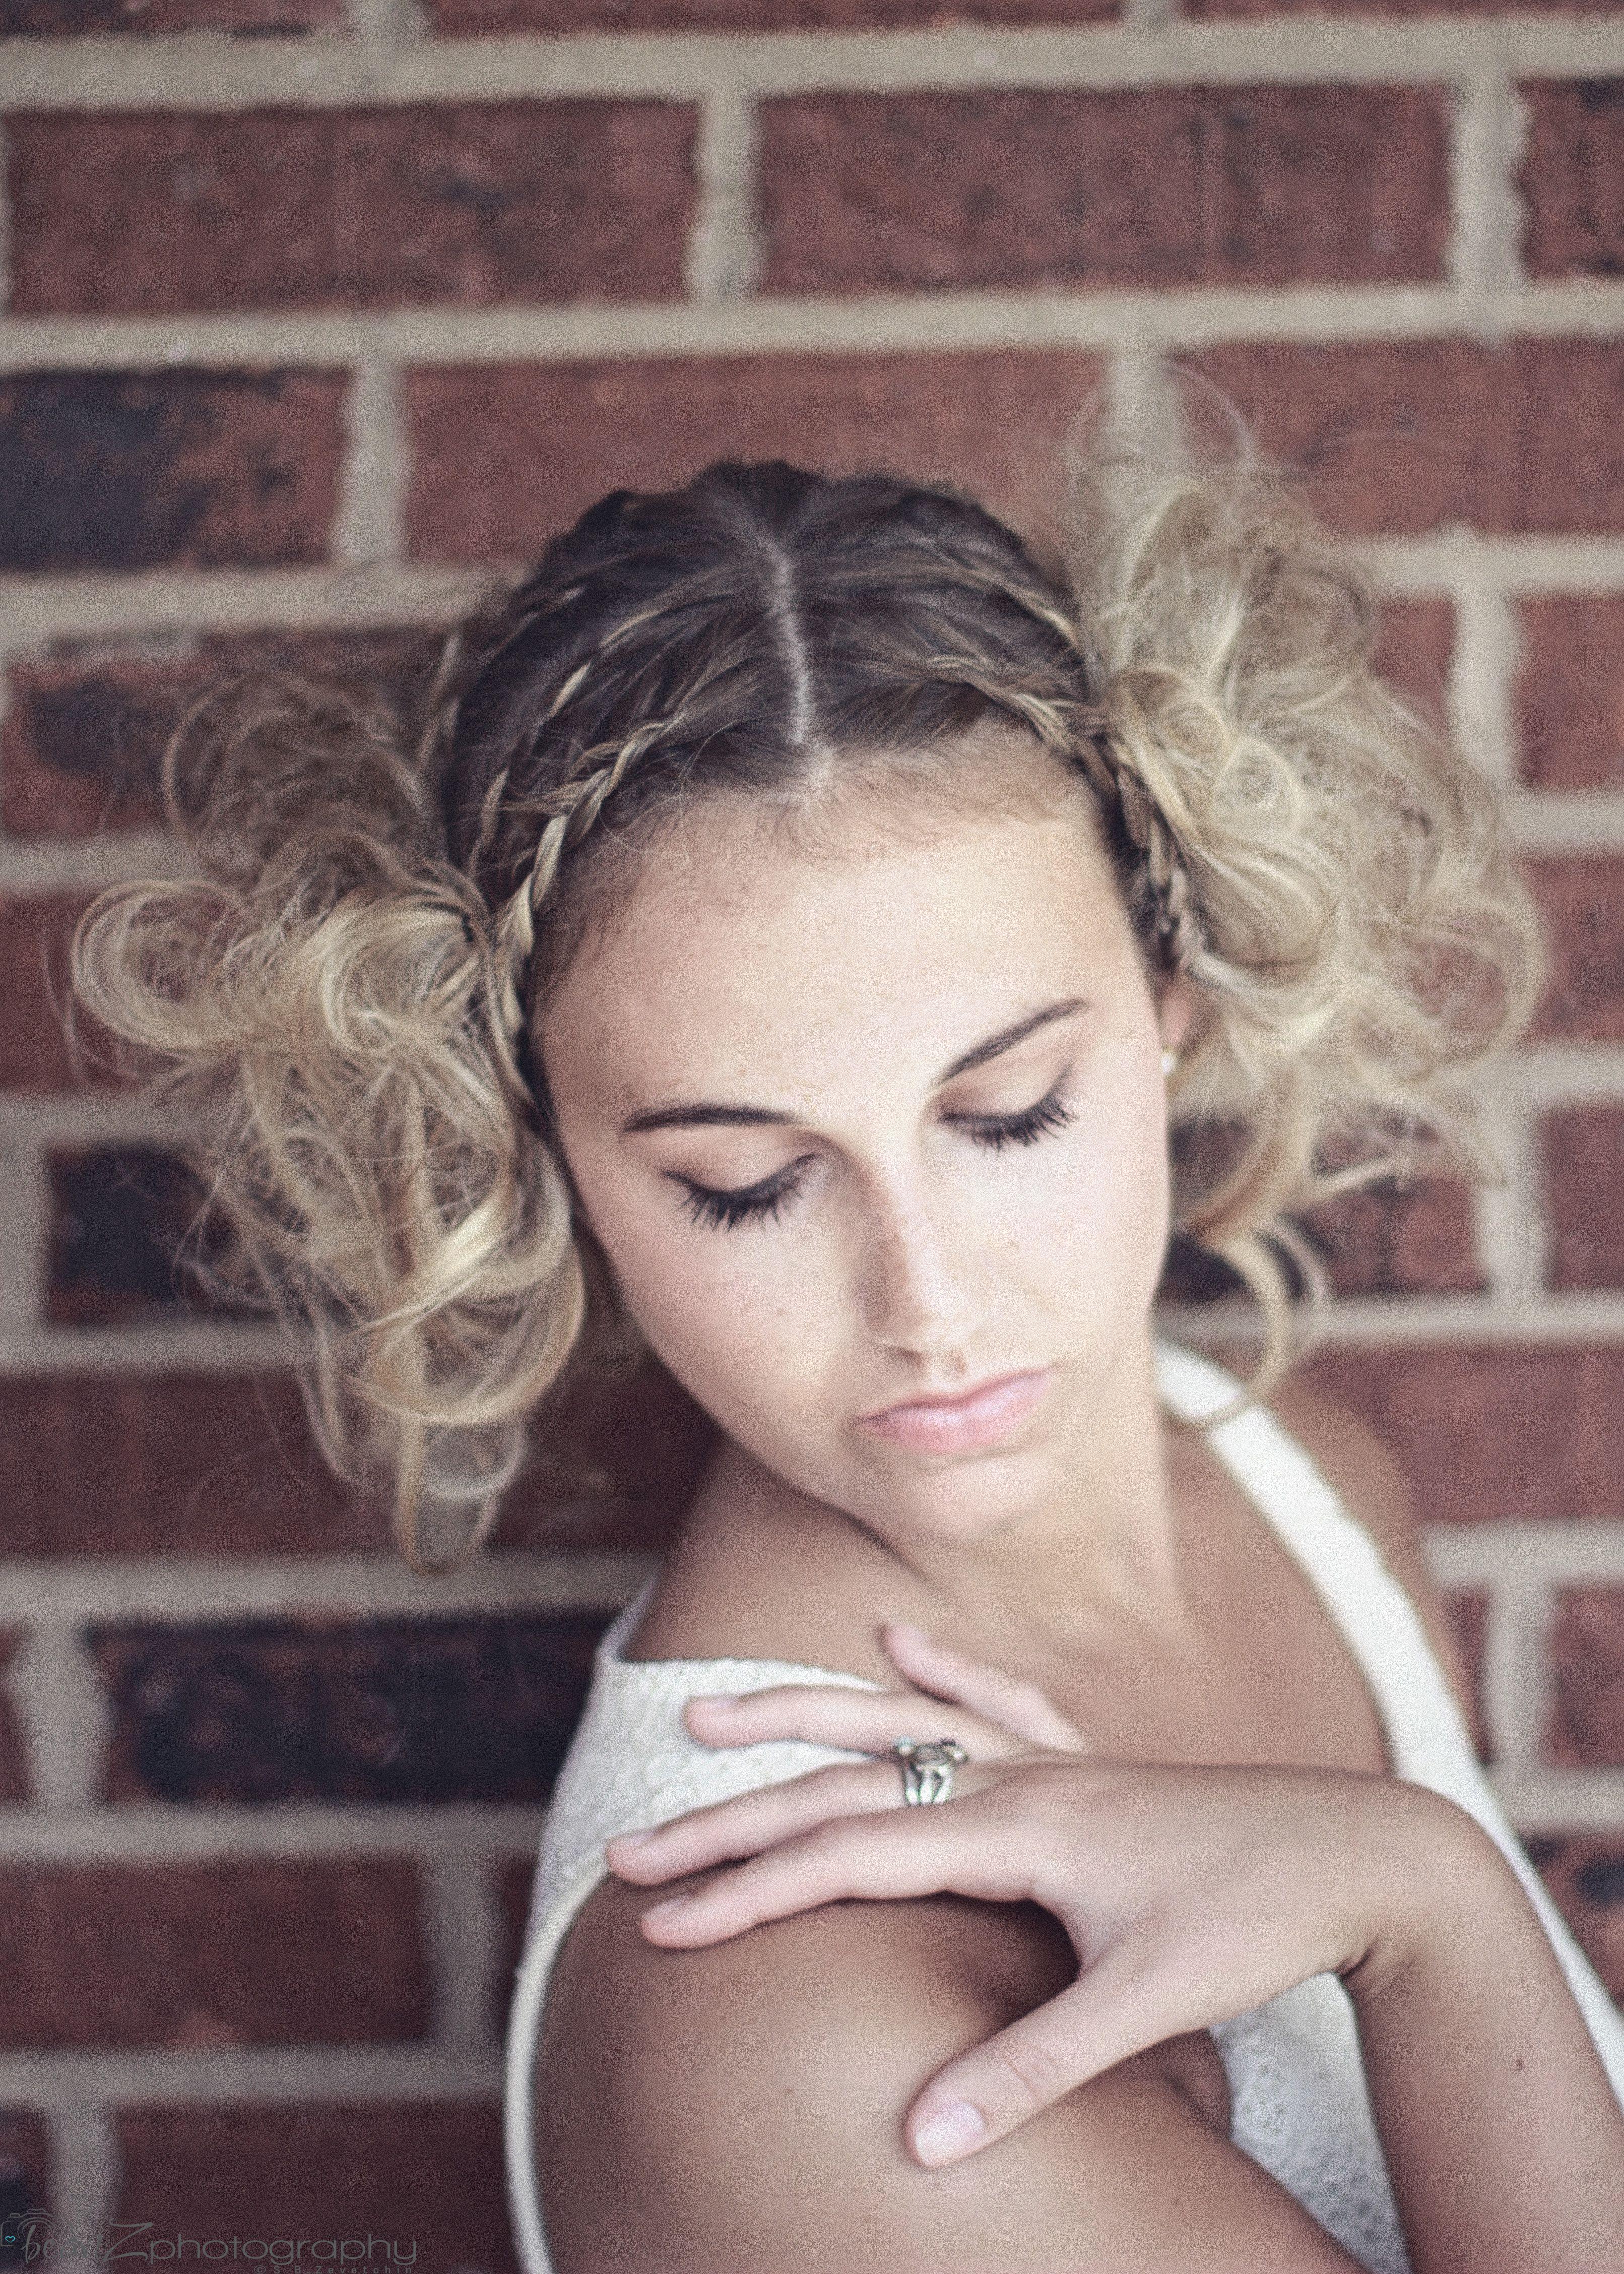 summer photoshoot bohemian princess blonde updo braids